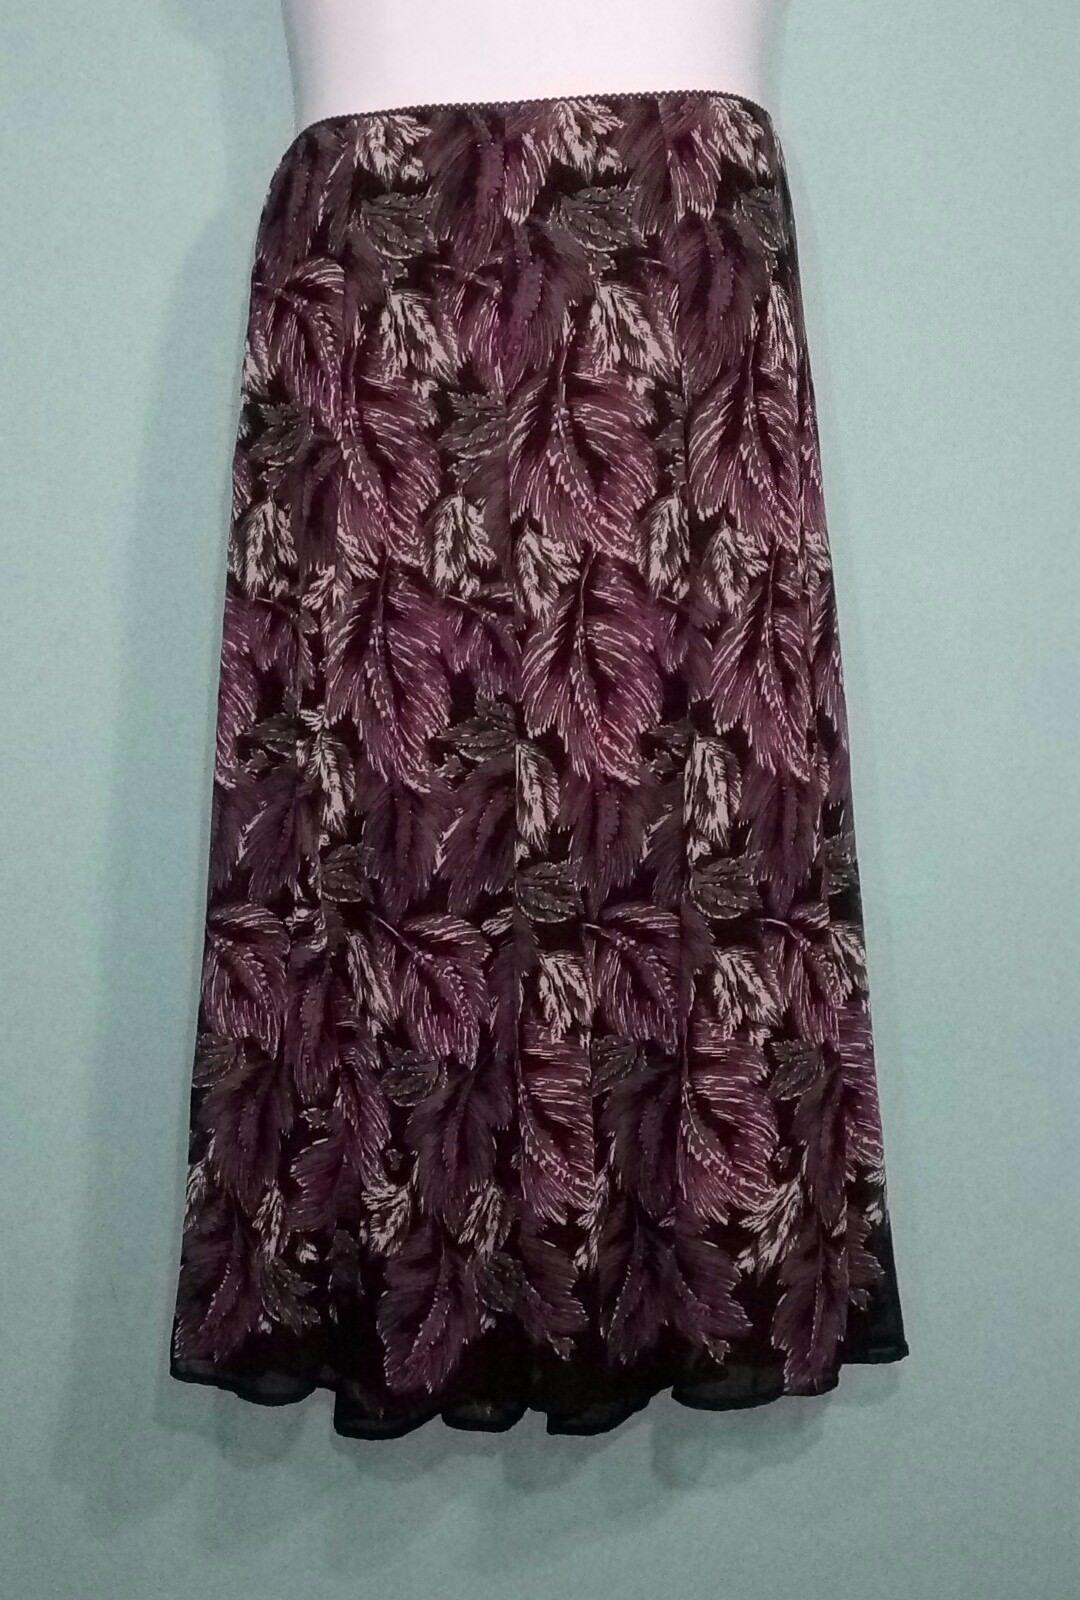 JM Collection  Women's Skirt Sheer Palm Print Size 14